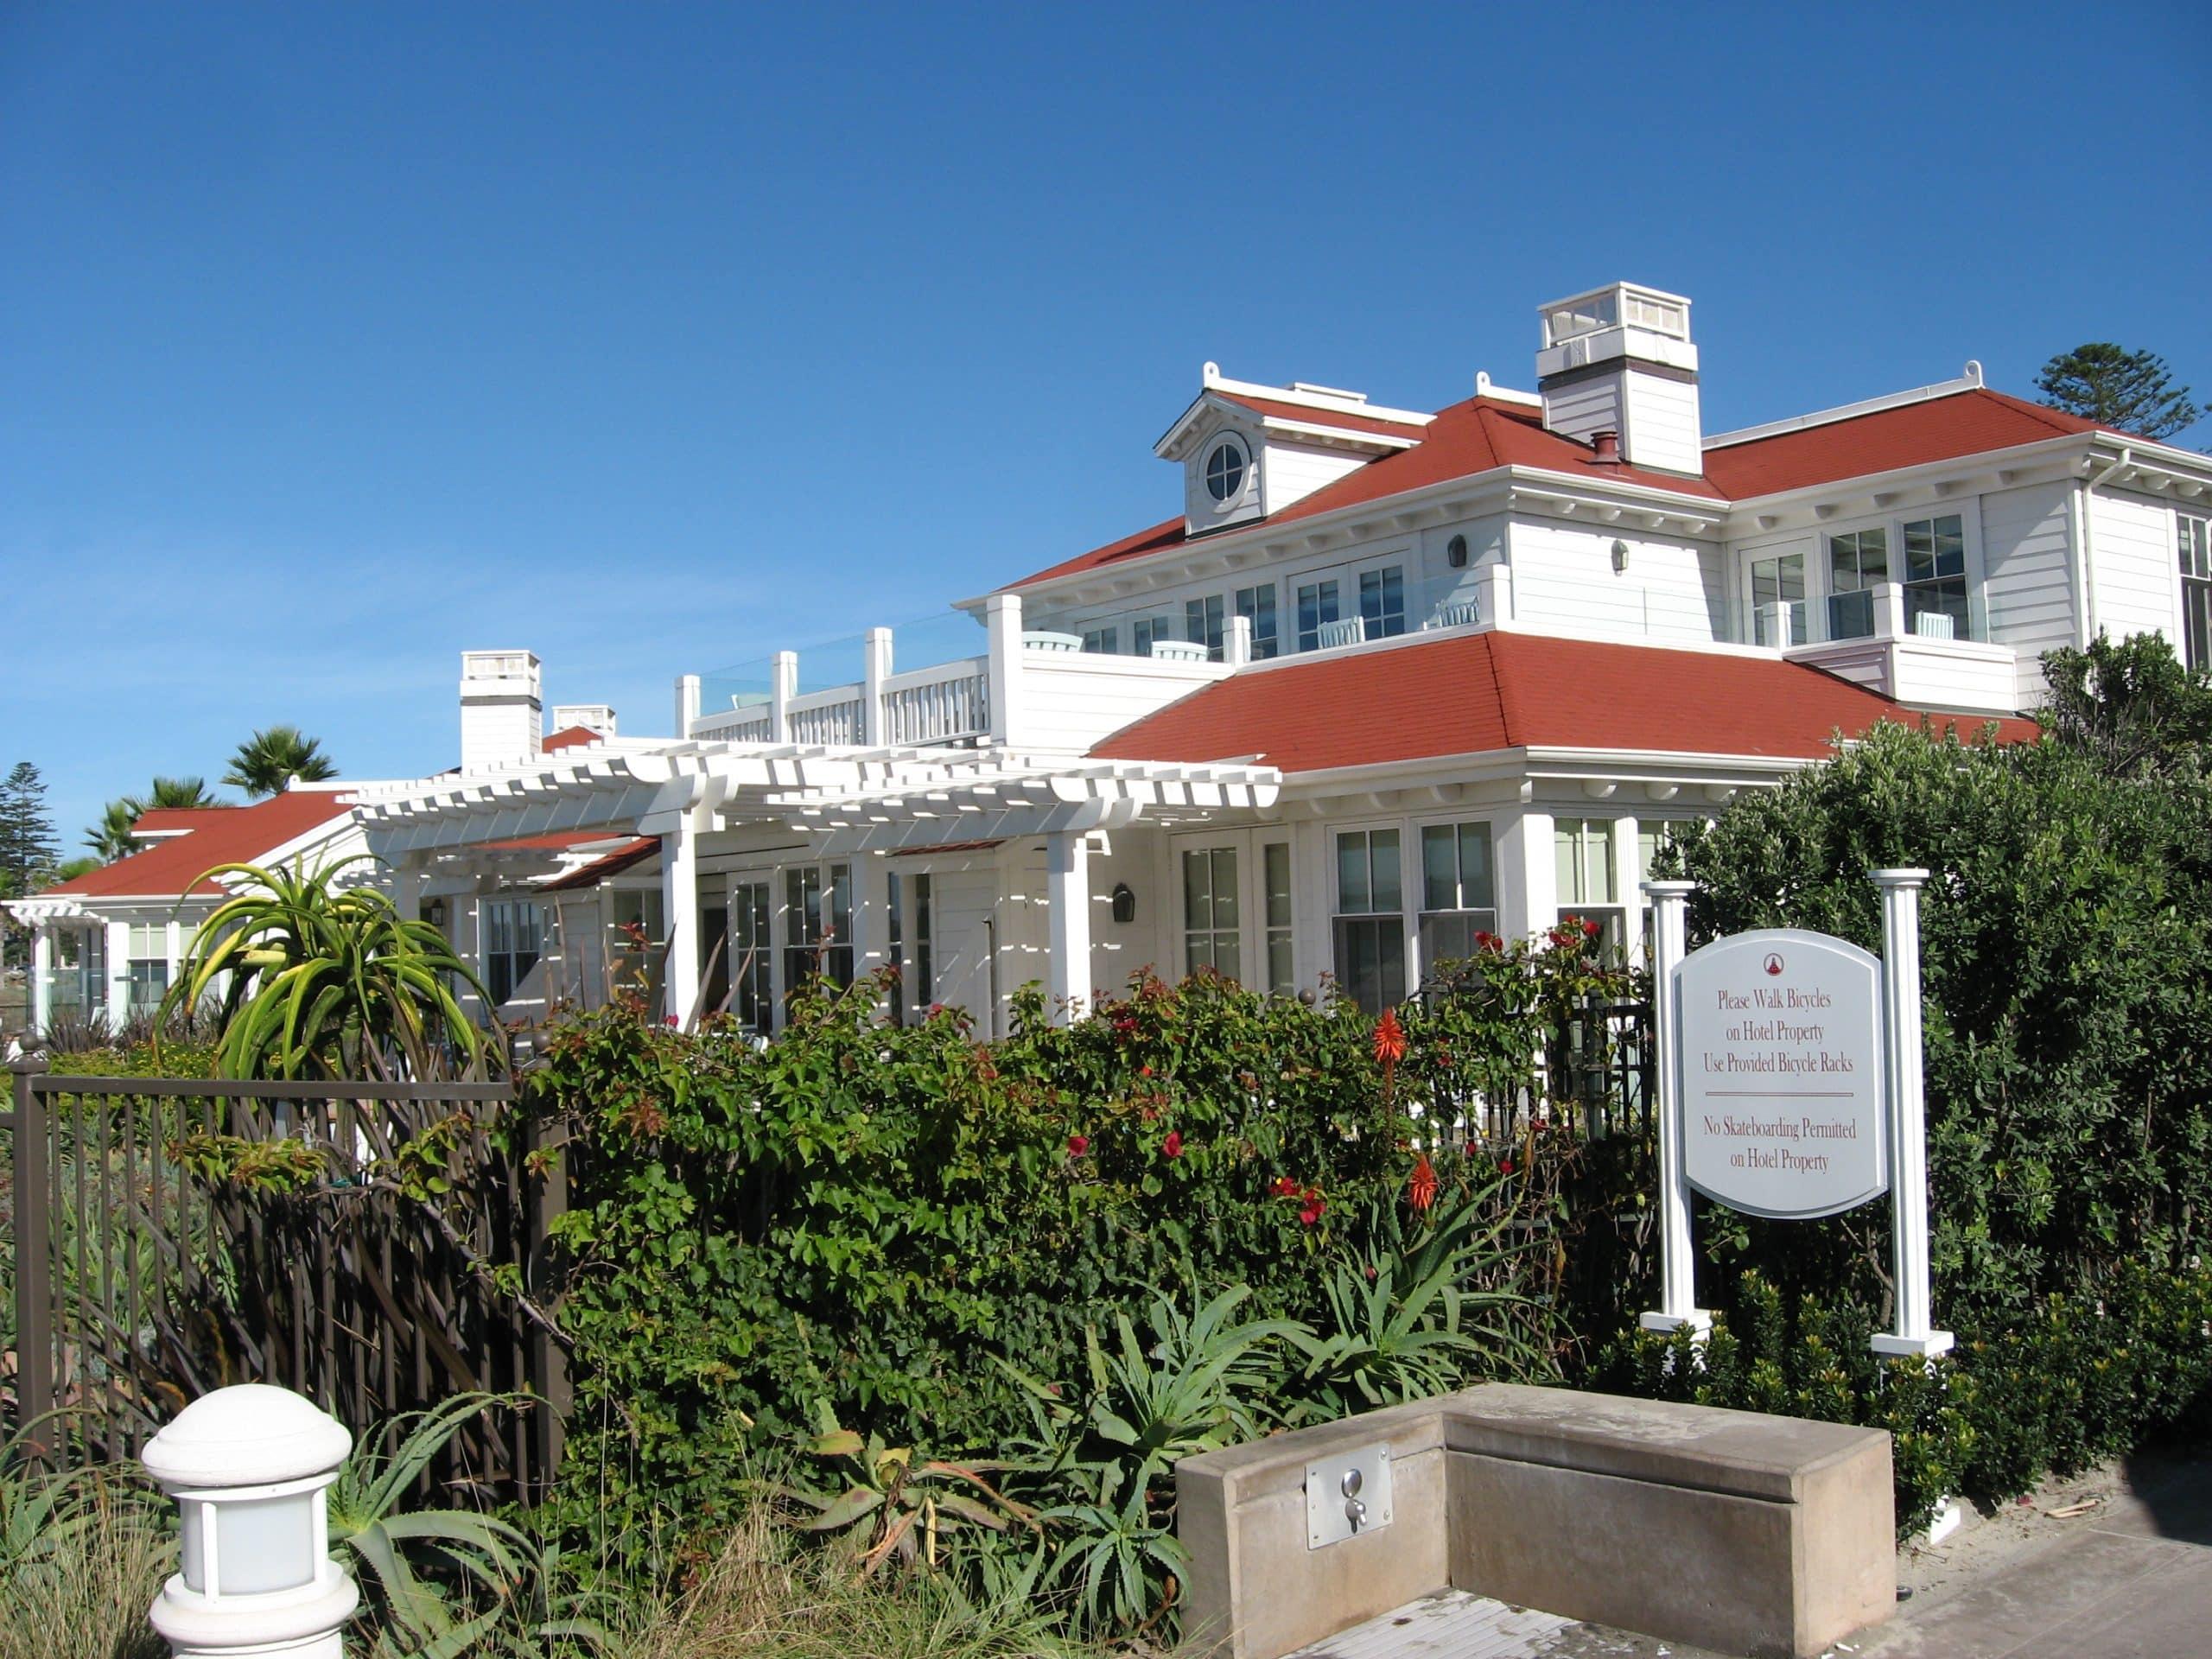 Coronado property management